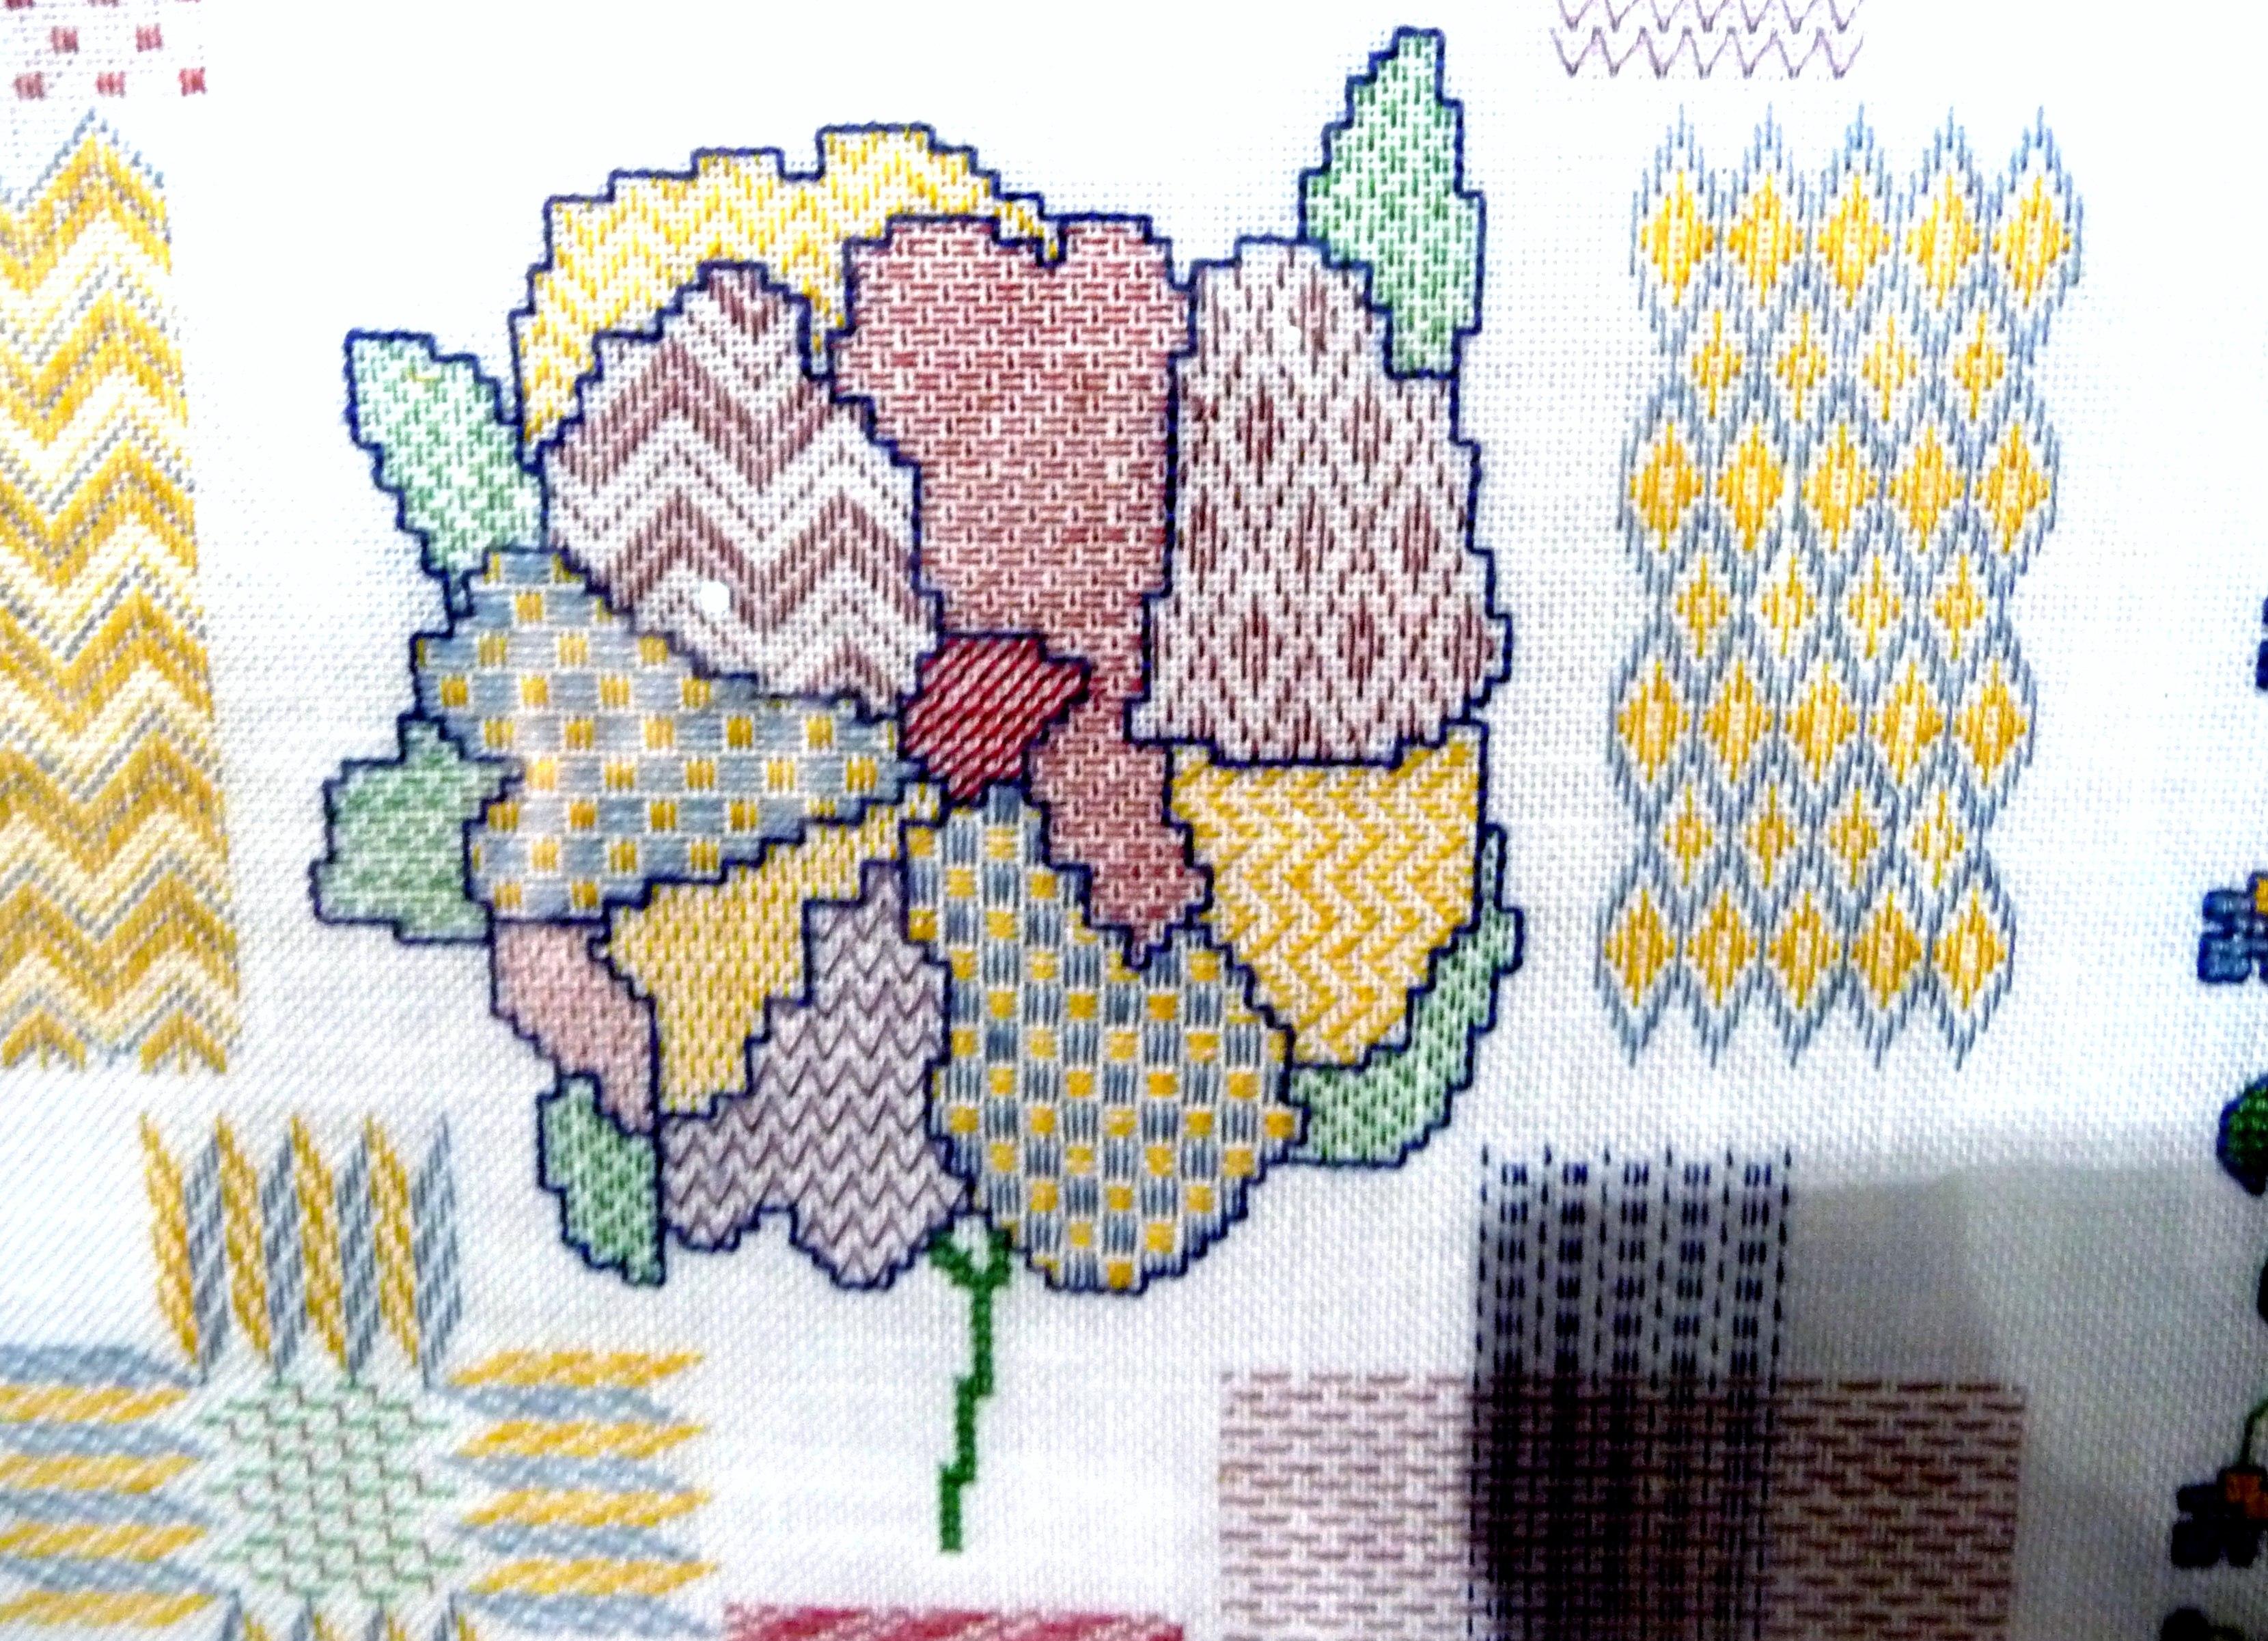 (detail) GARDENIA -DARNING SAMPLER by Gill McKenna, hand embroidery on linen